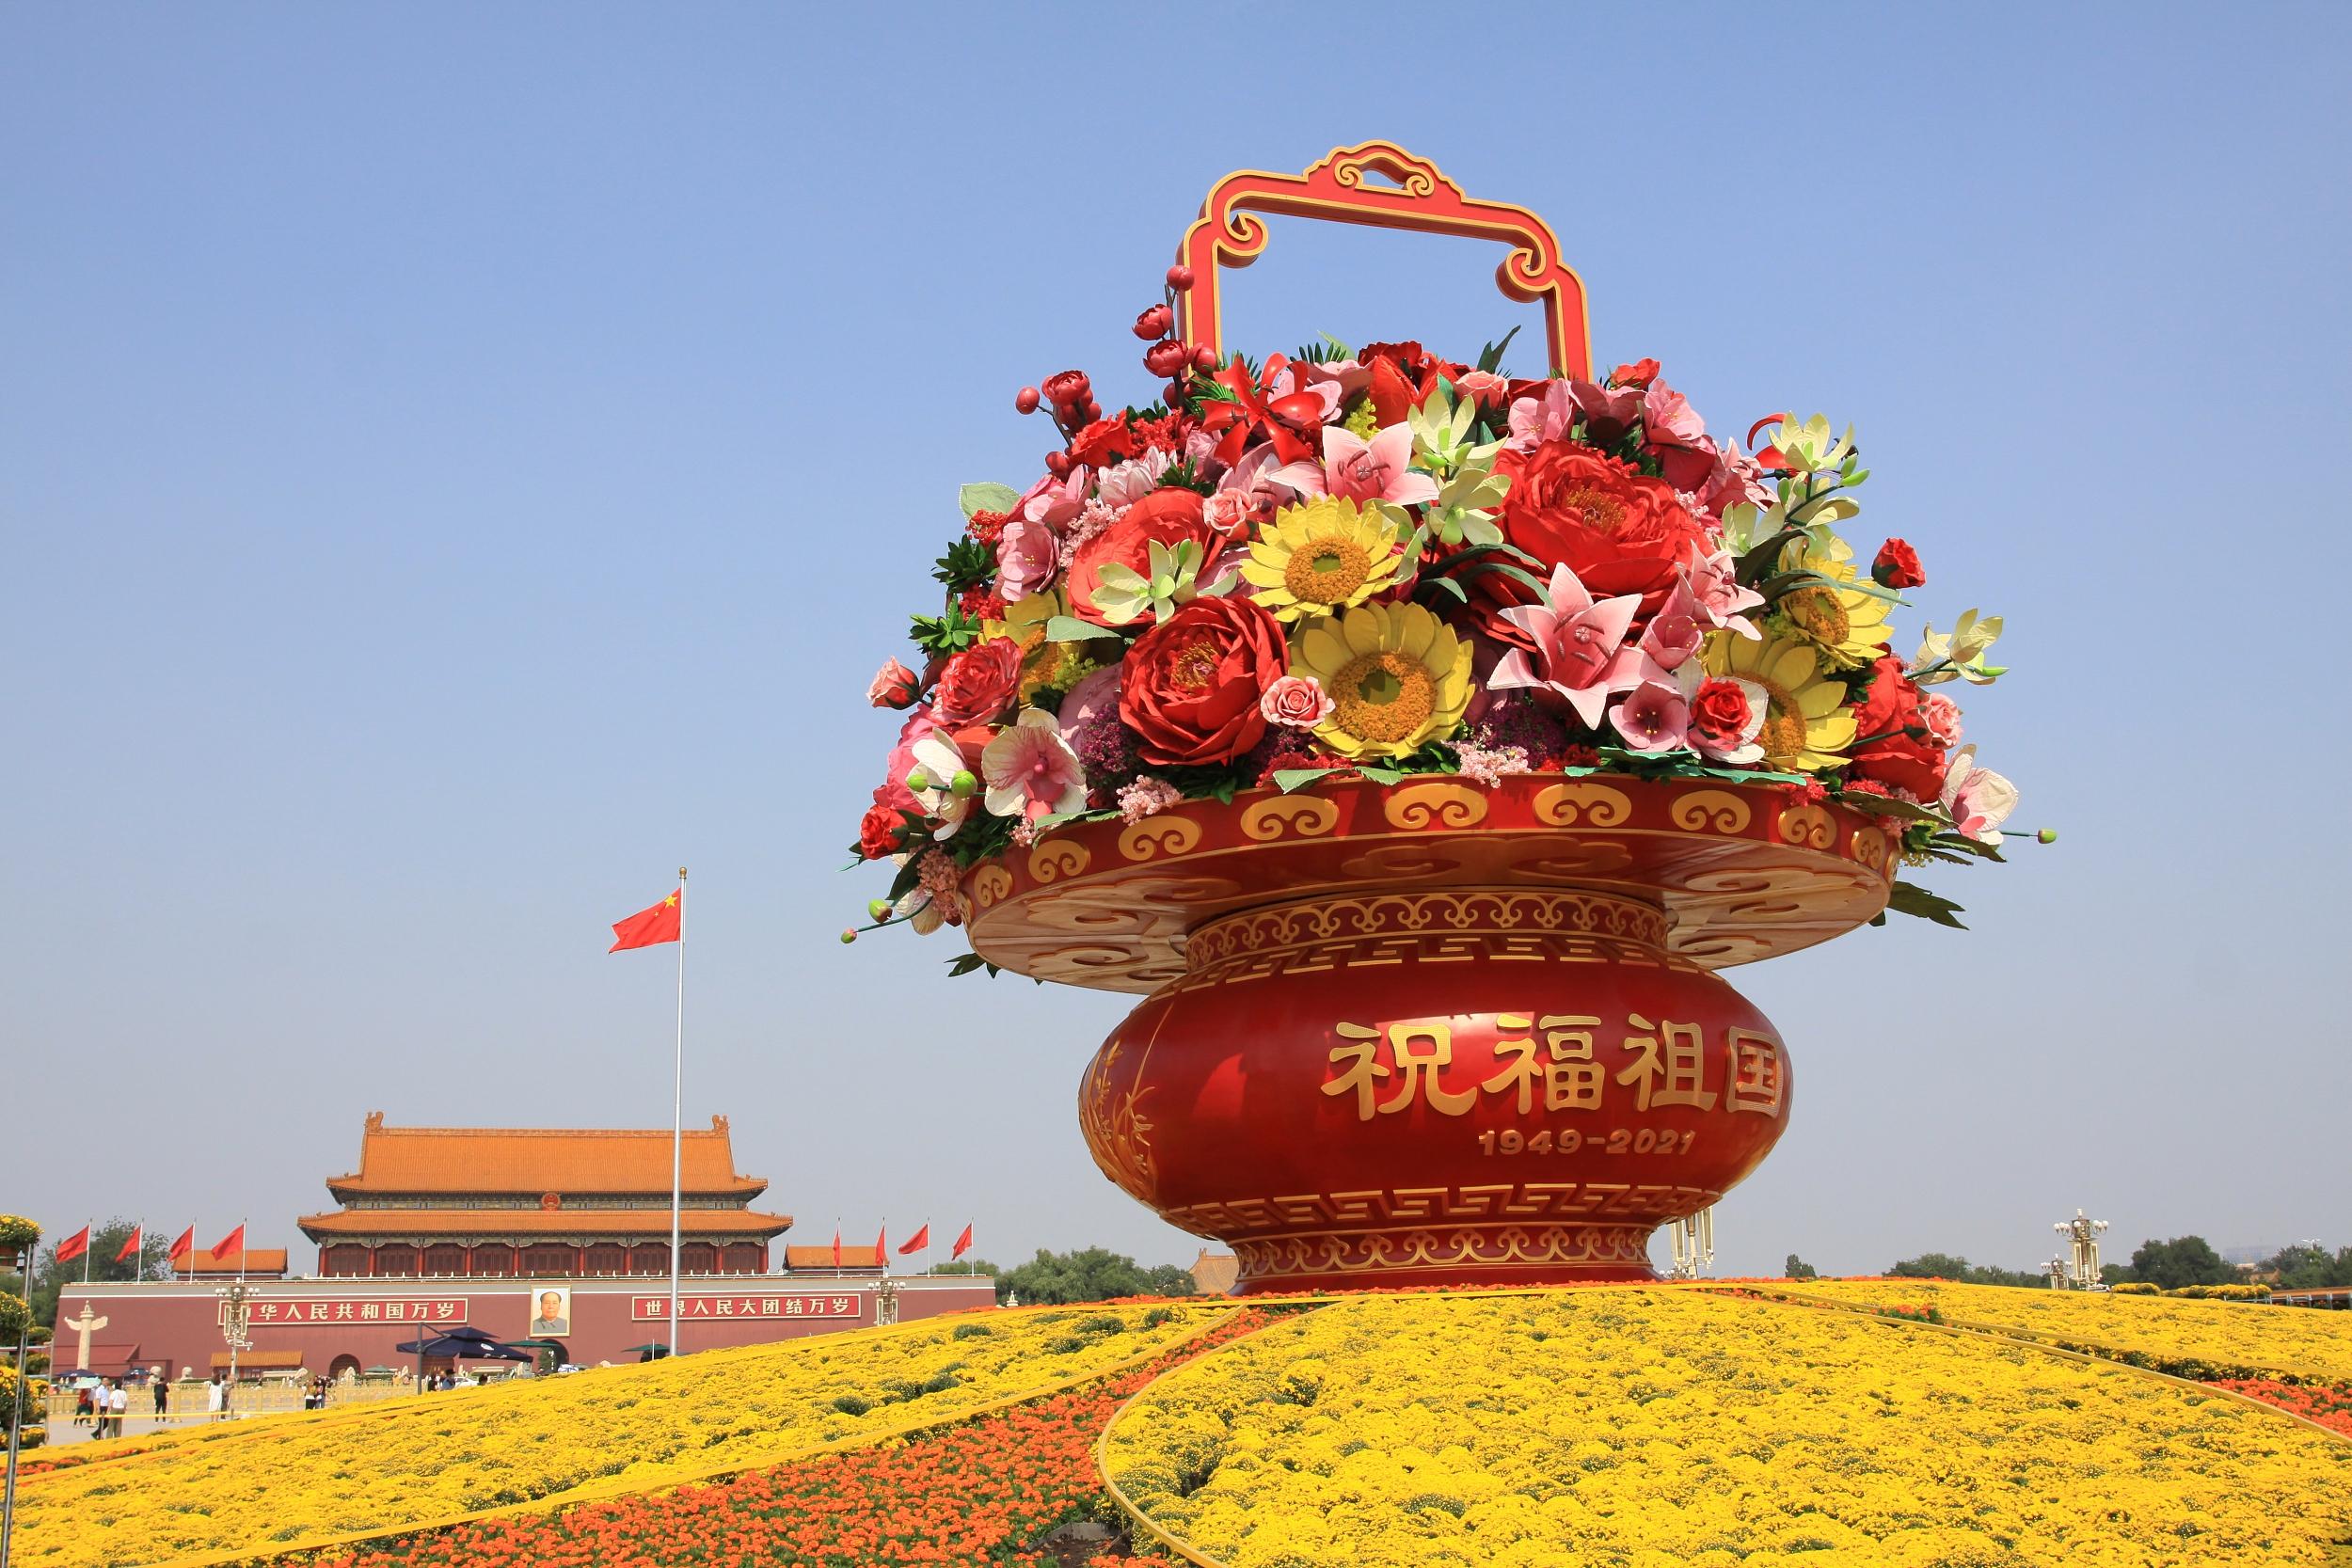 """祝(zhu)福祖國""大(da)花籃亮(liang)相(xiang)天安(an)門廣場"